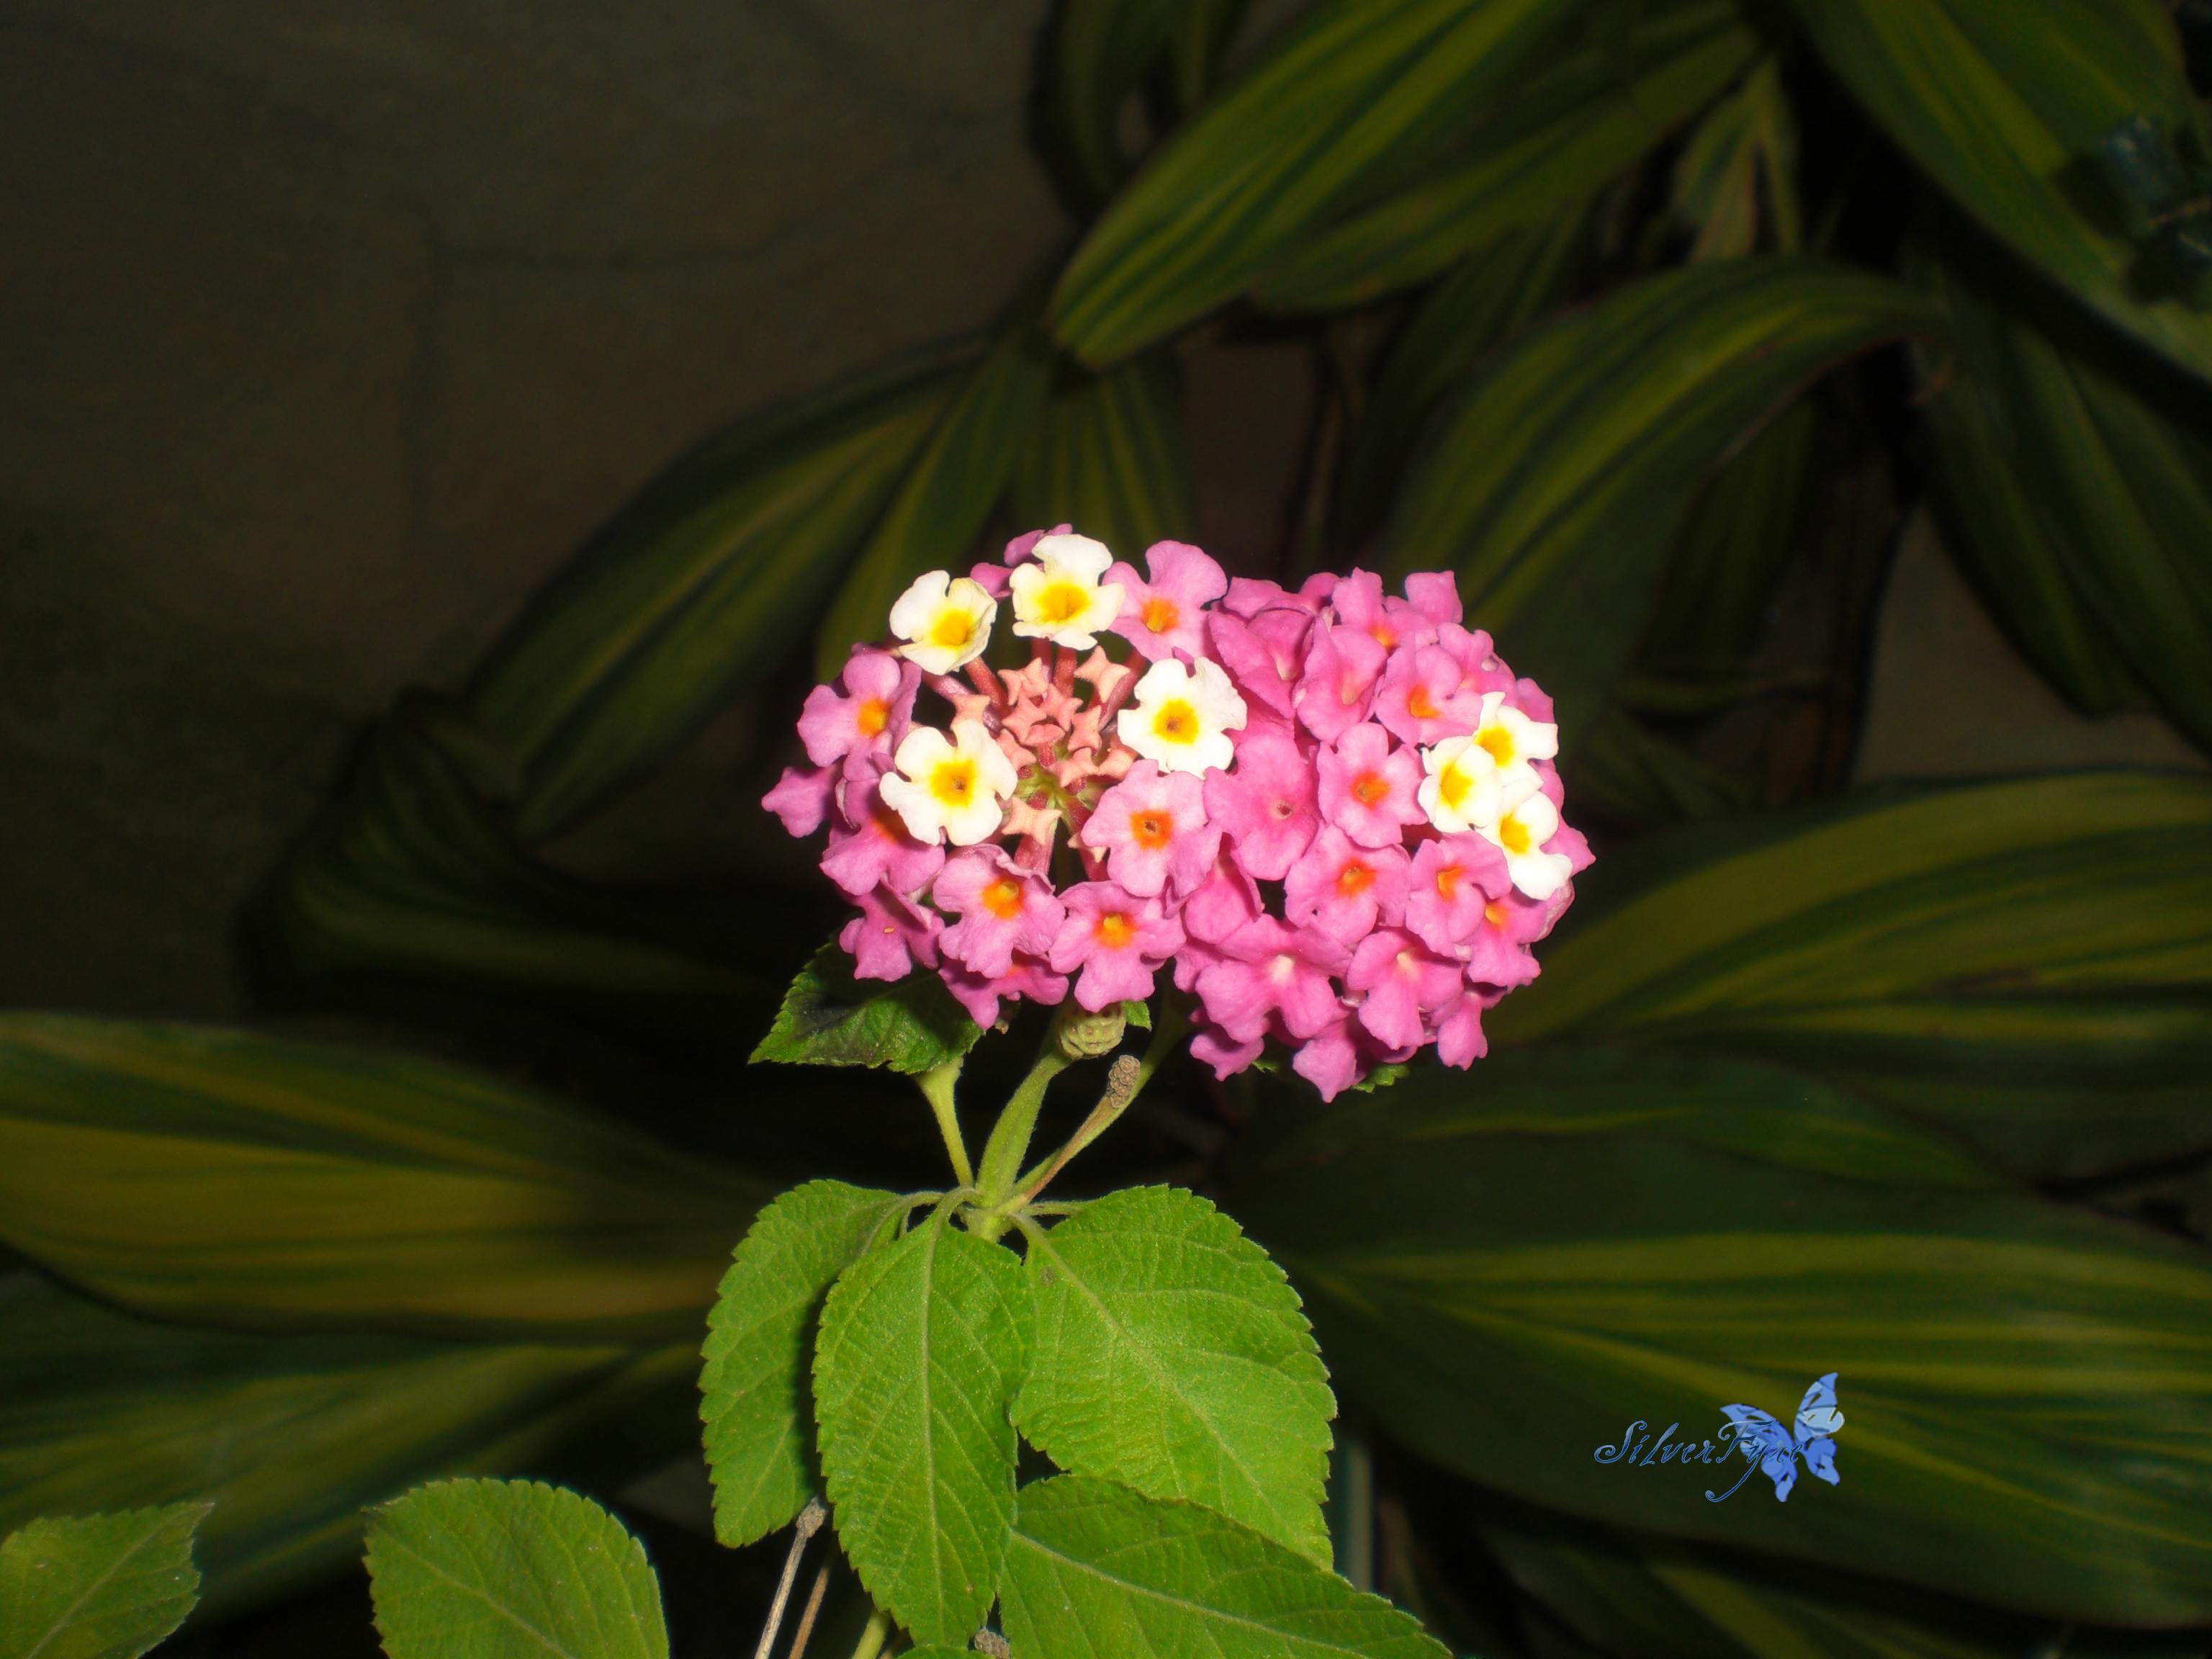 Flowers by bloodyblue